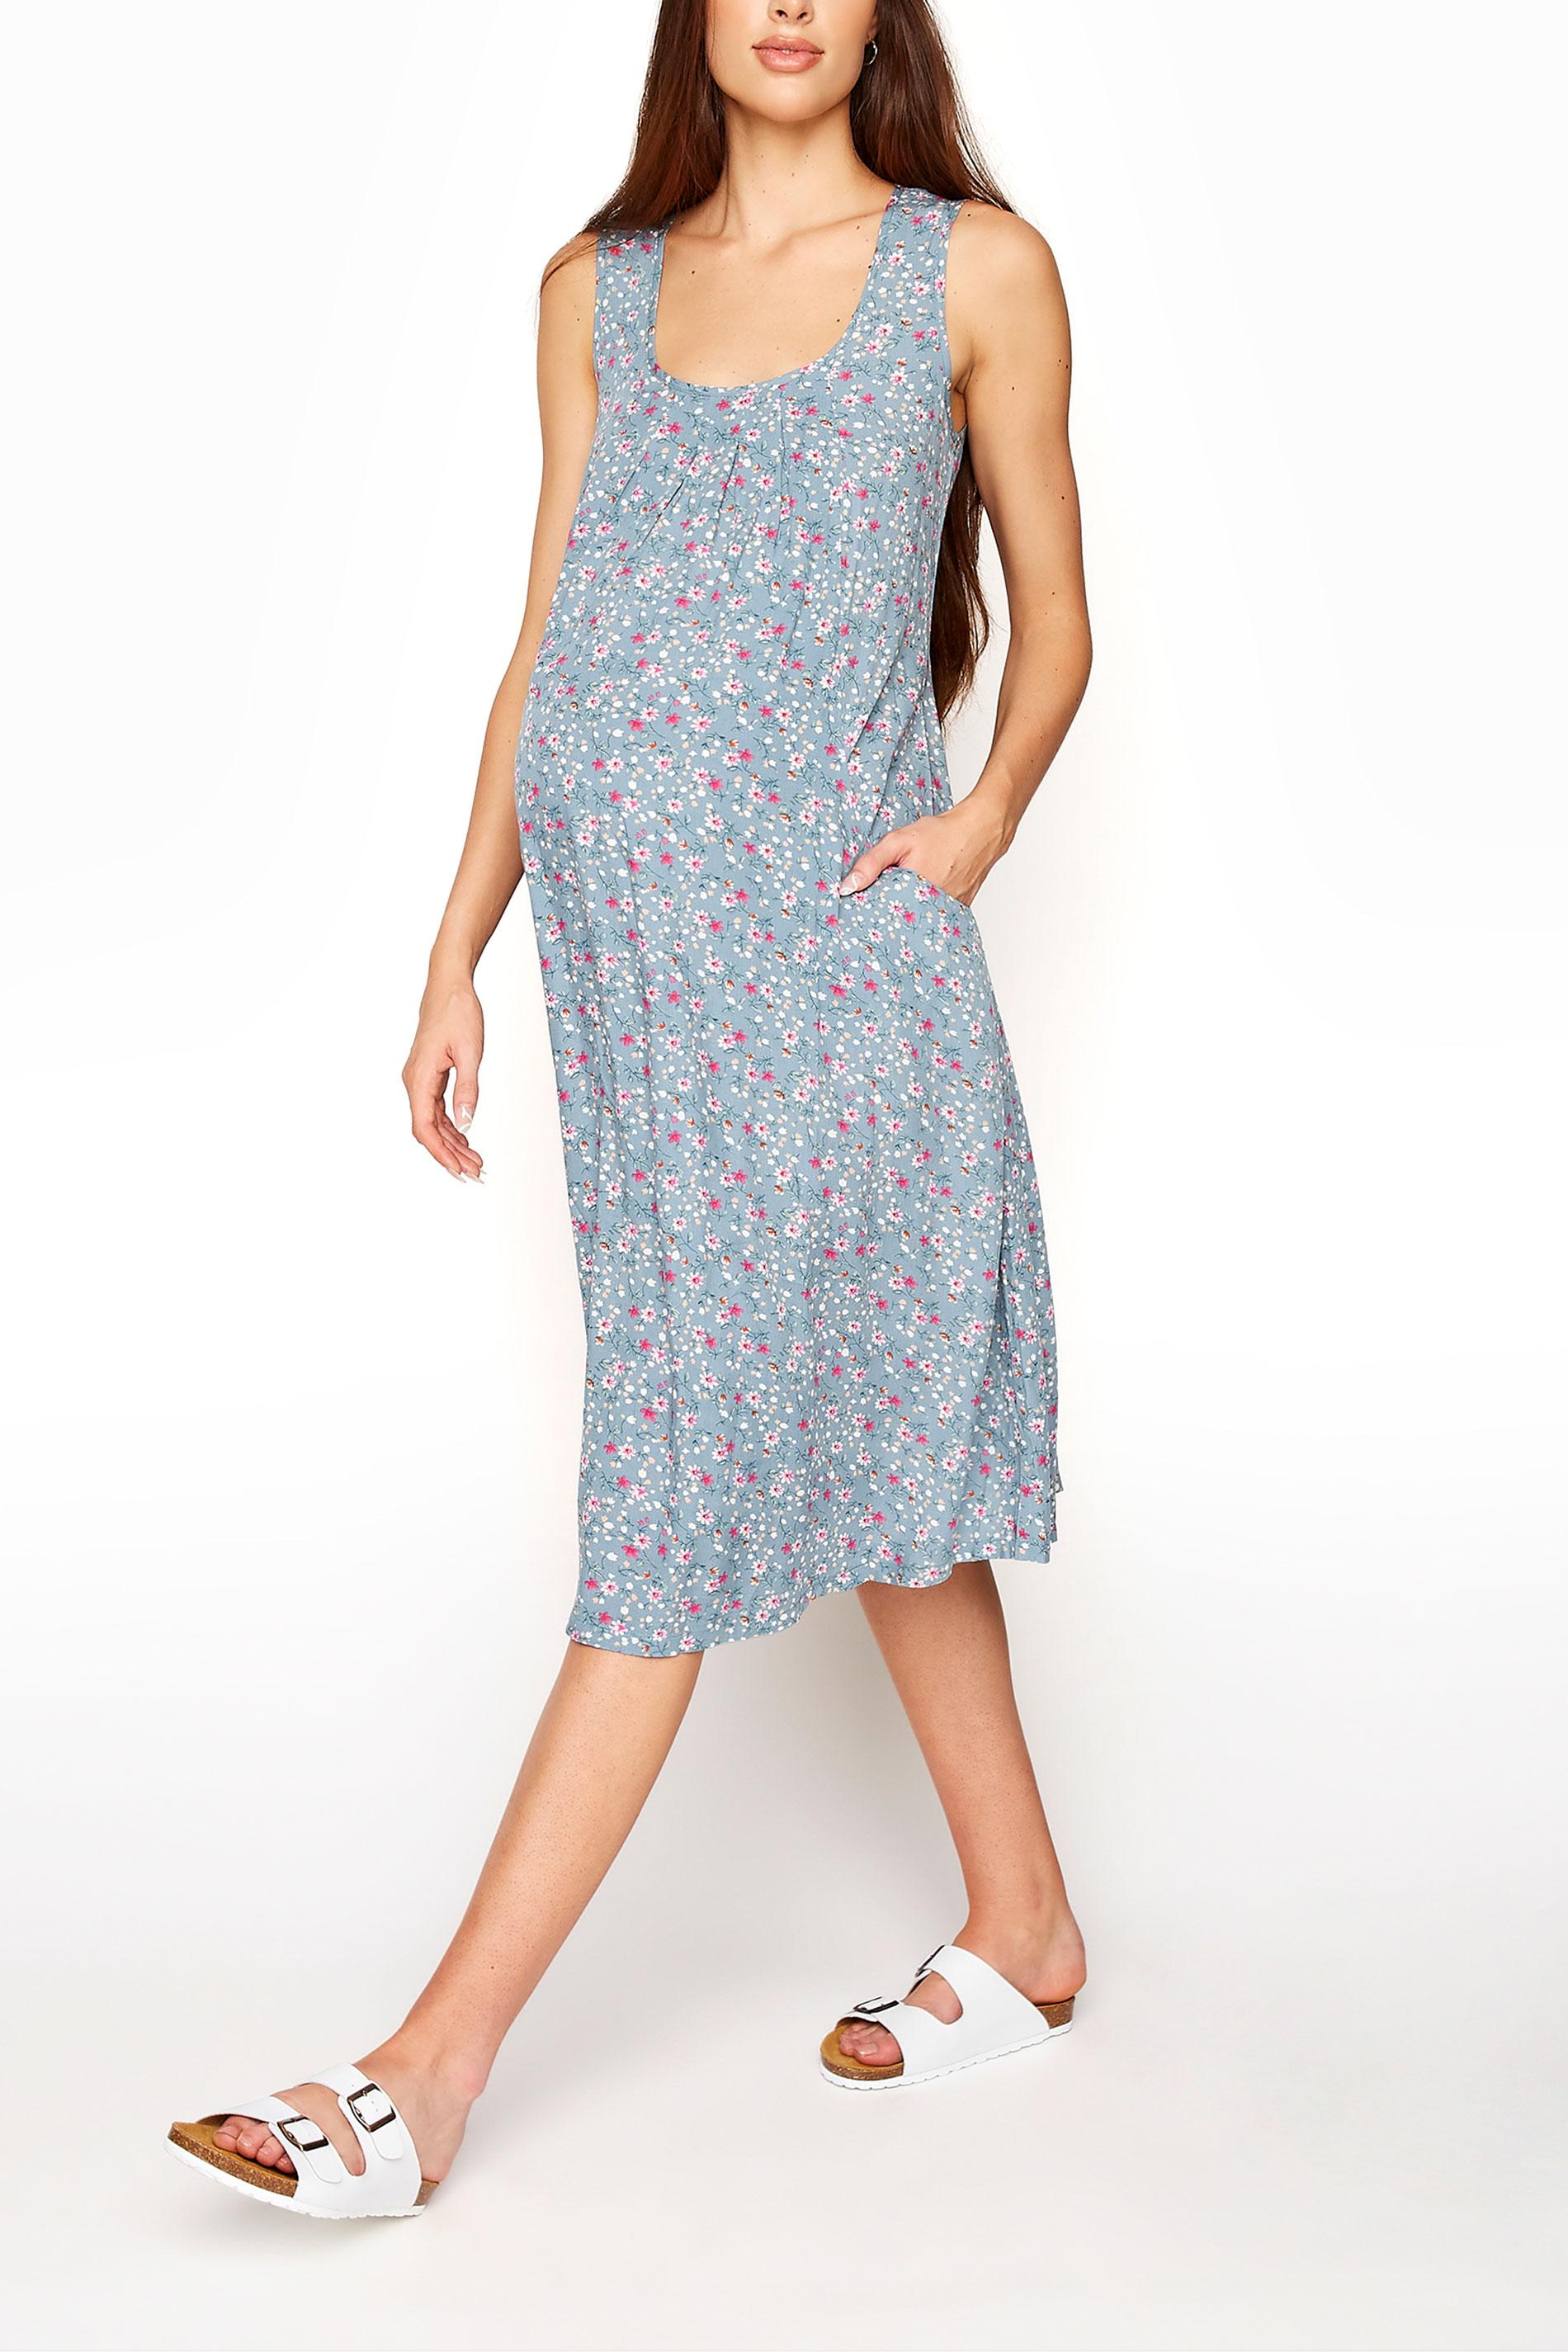 LTS Maternity Blue Floral Sleeveless Dress